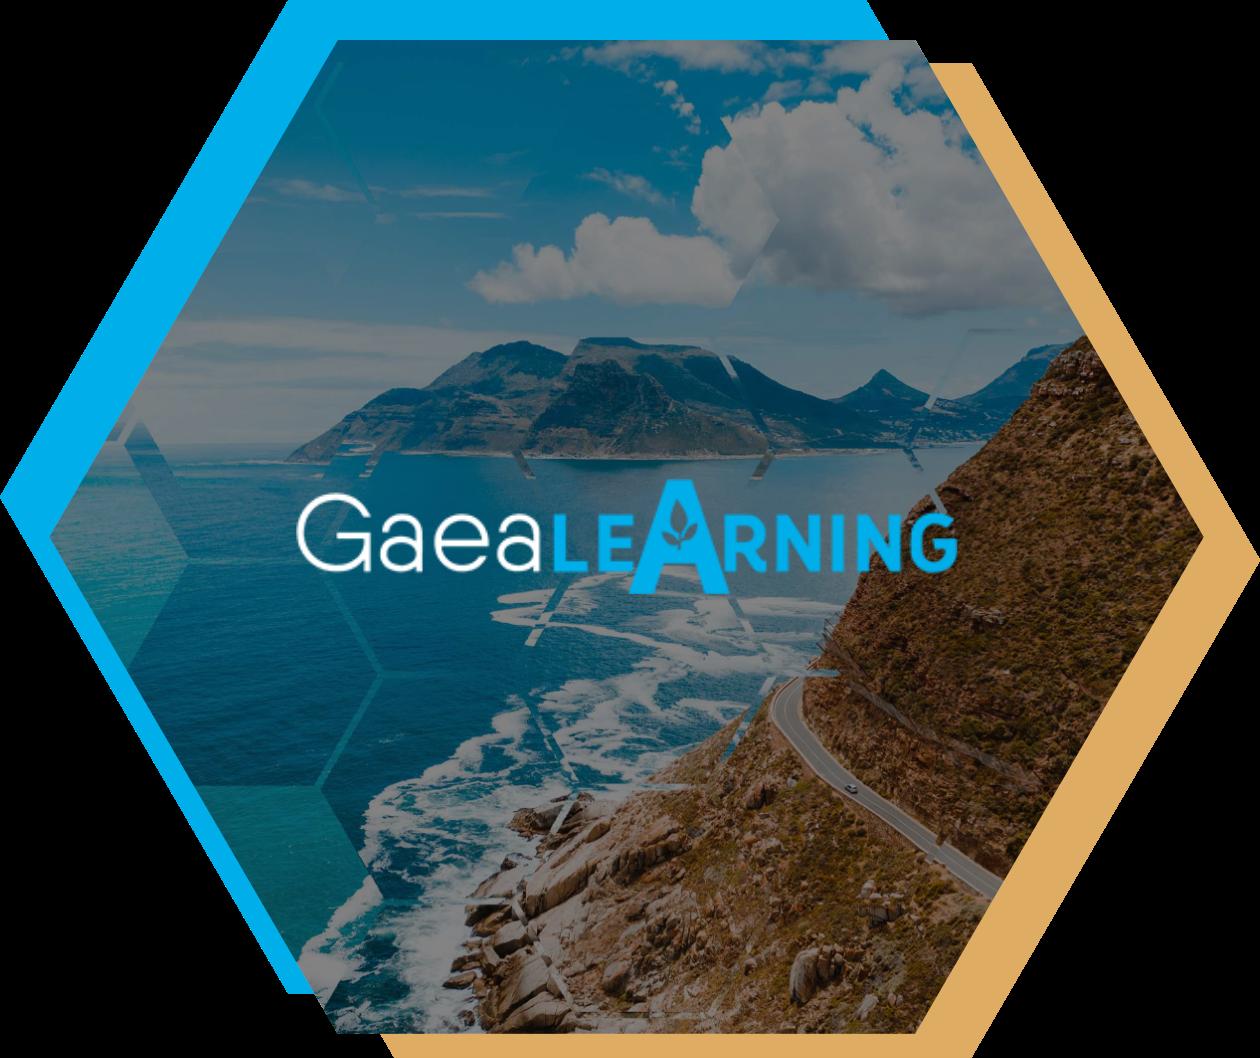 GaeaLearning